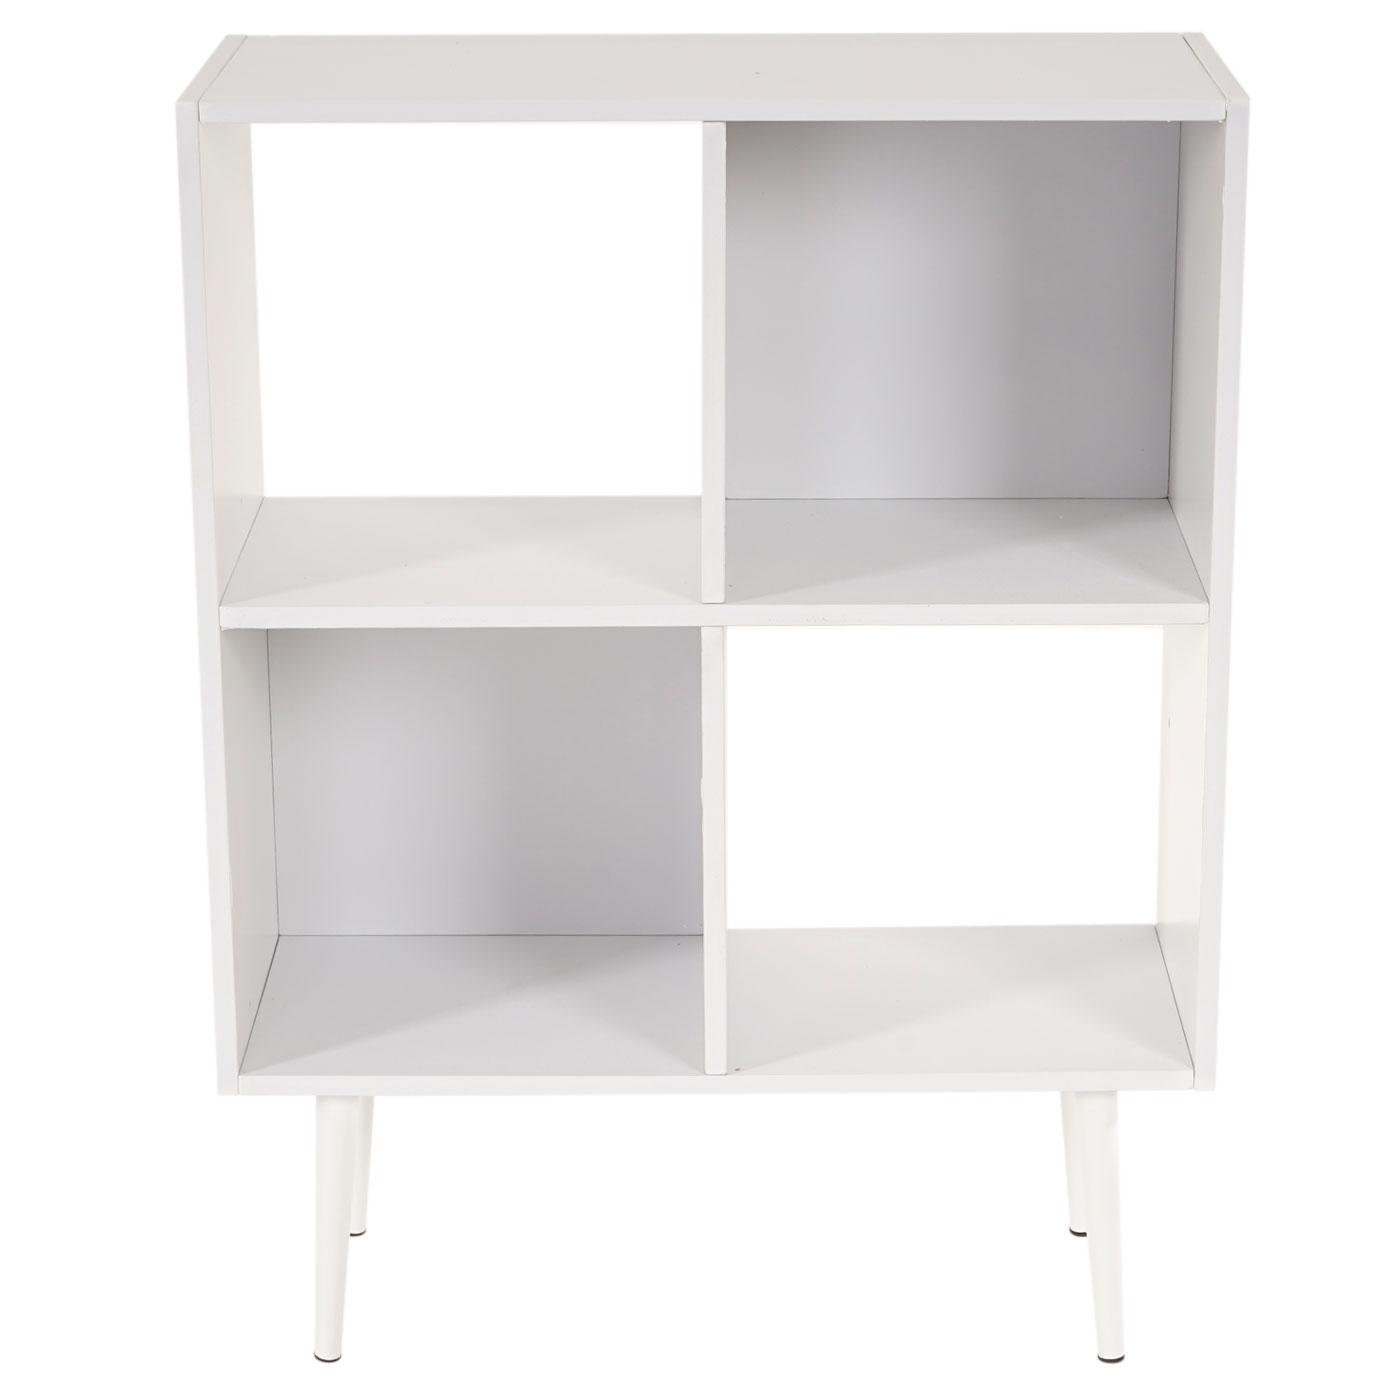 regal malm t340 standregal b cherregal retro design 94x71x30cm 4 f cher wei. Black Bedroom Furniture Sets. Home Design Ideas